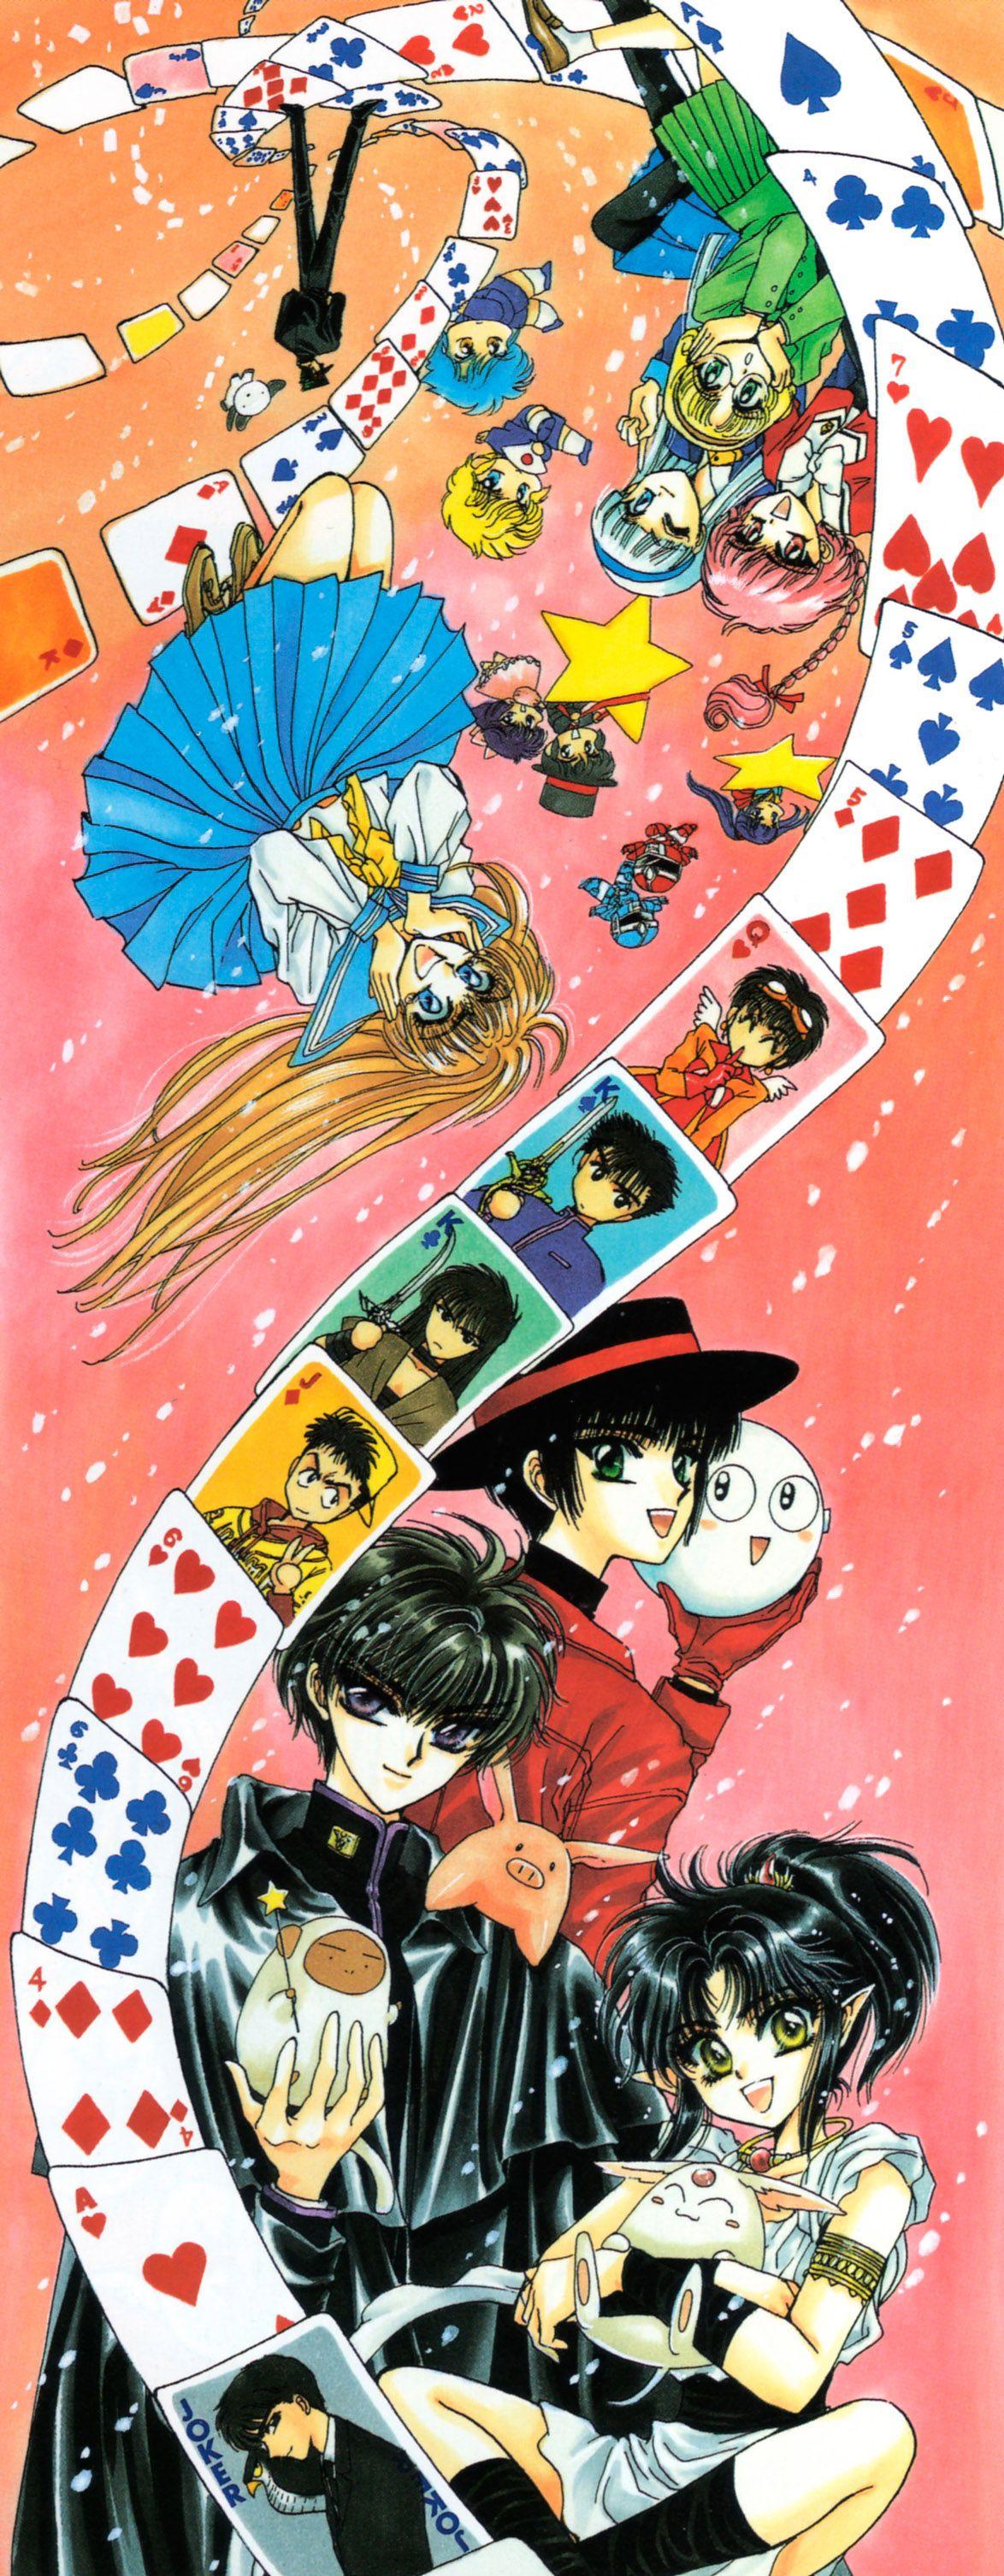 Clamp493651 anime clamp manga artist